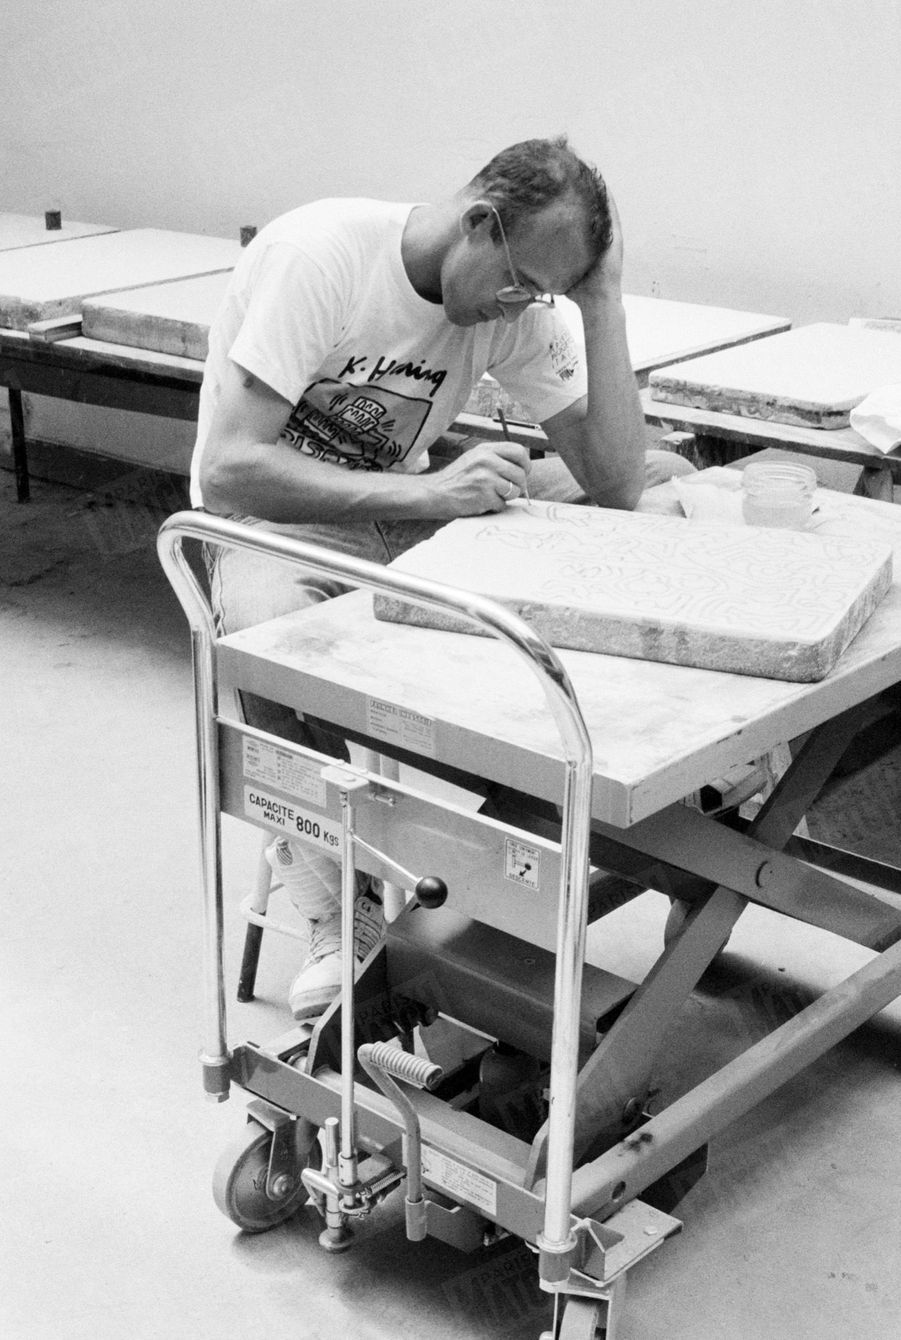 Keith Haring dans son atelier parisien, en juin 1989